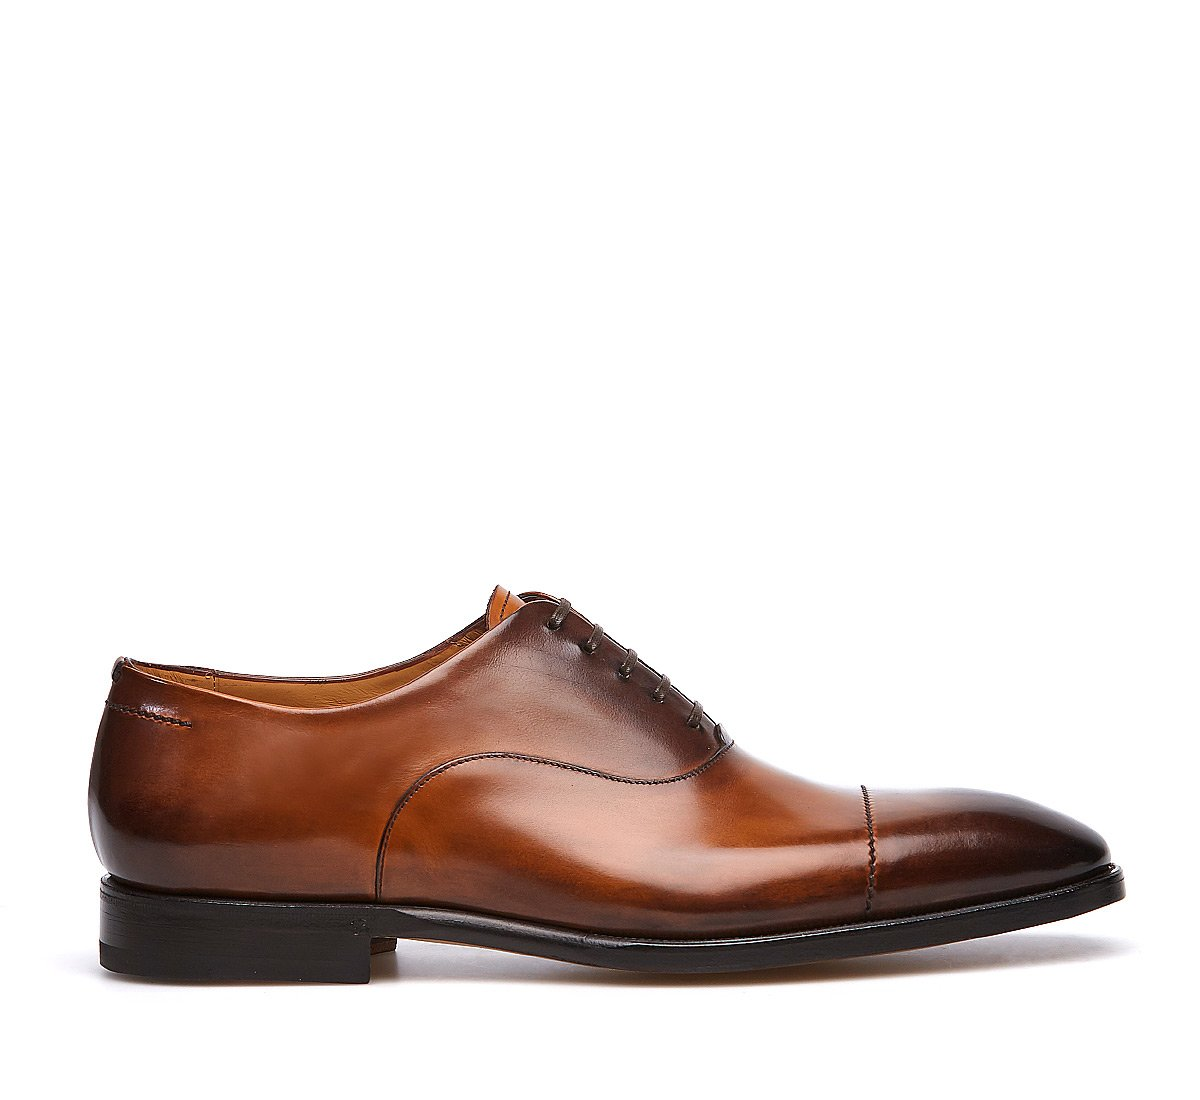 Flex Oxford shoe in hand-buffed calf leather